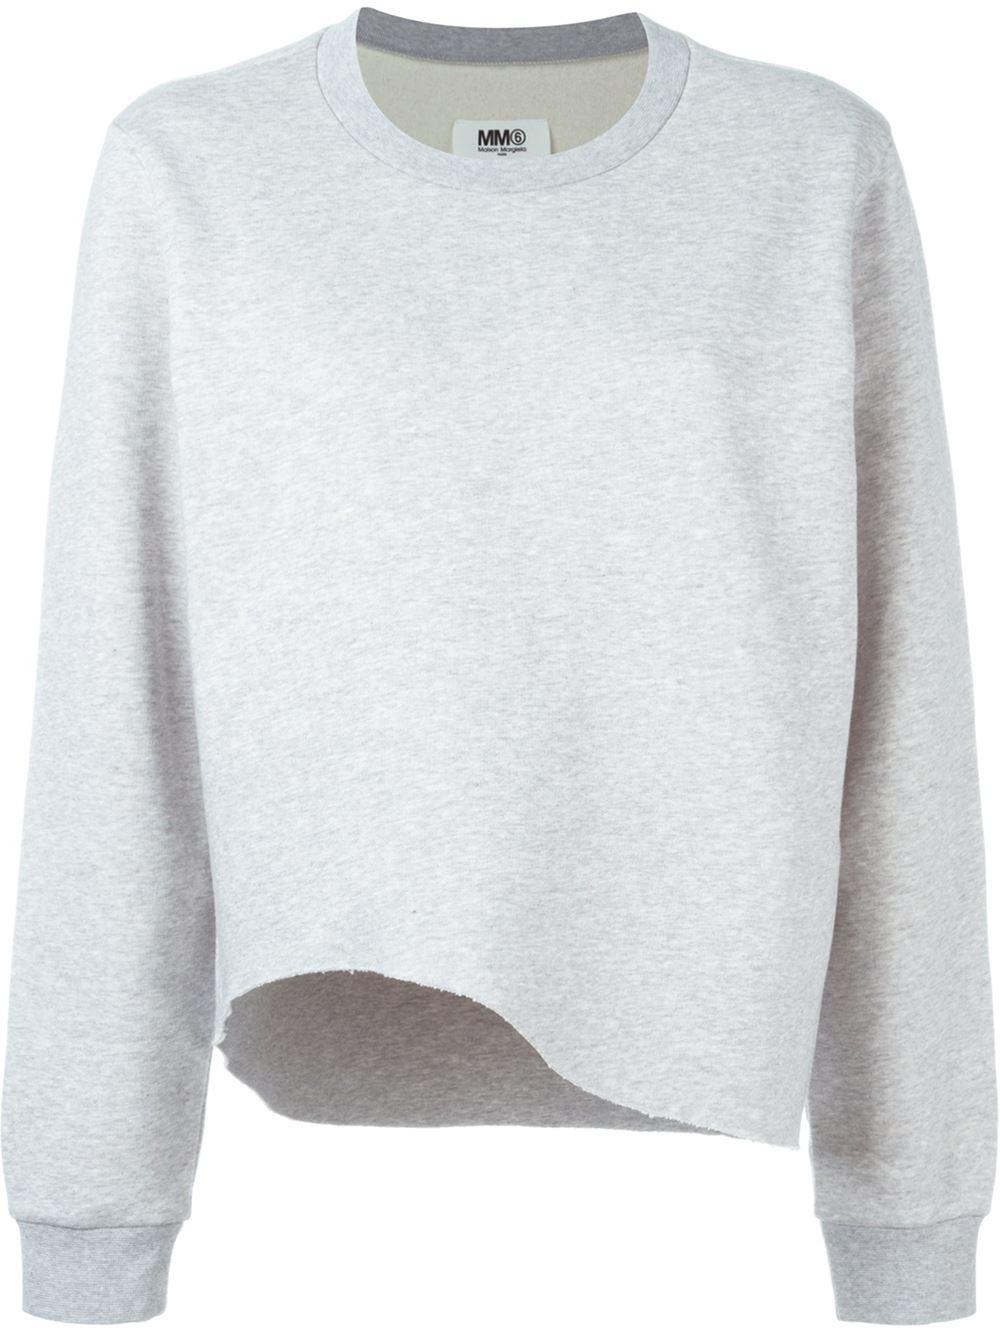 longsleeved loose sweater - Grey Maison Martin Margiela 100% Guaranteed Cheap Price NzGVYe4nu